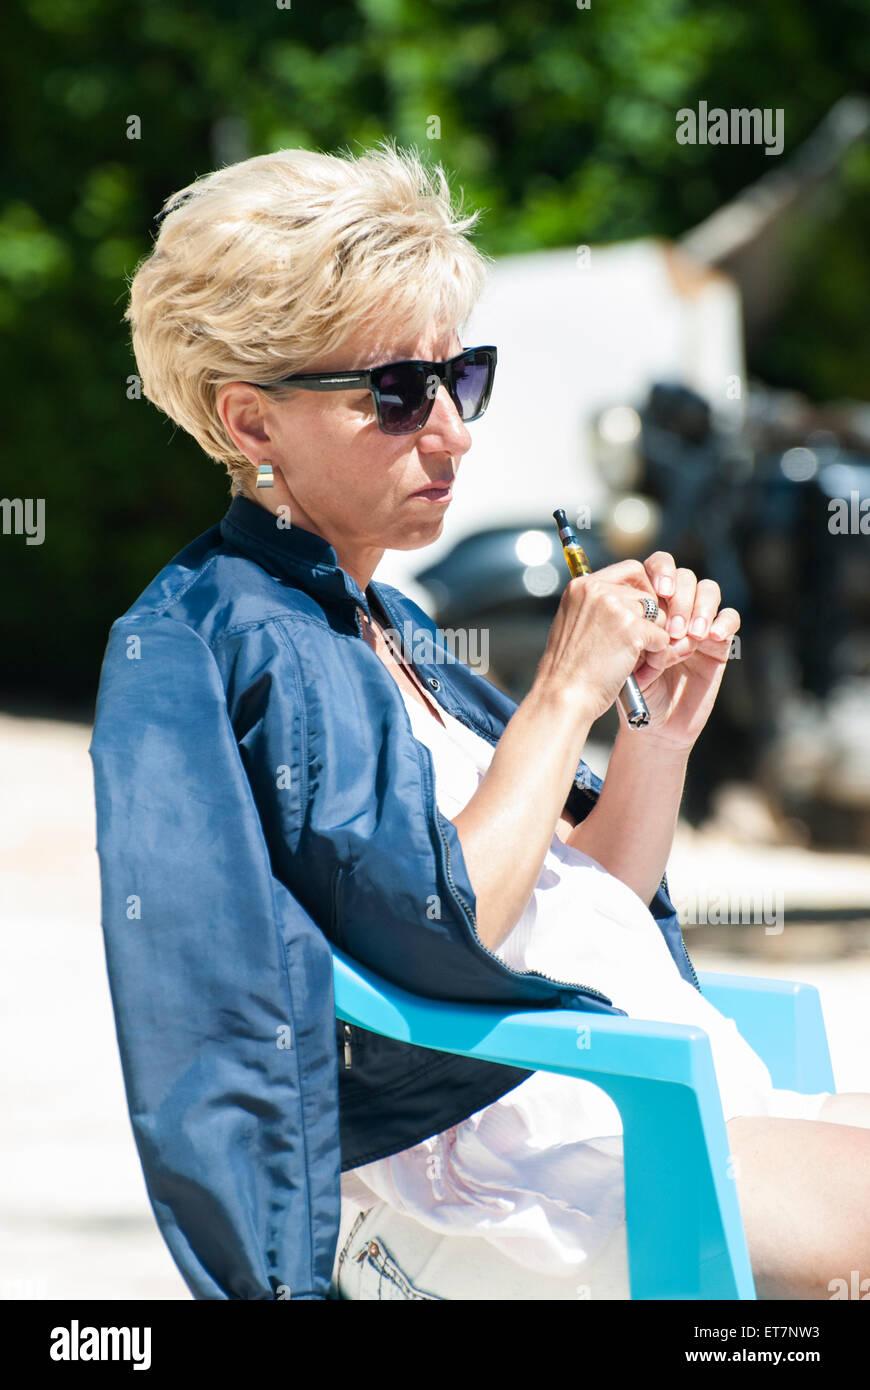 Woman vaping electronic cigarette - Stock Image